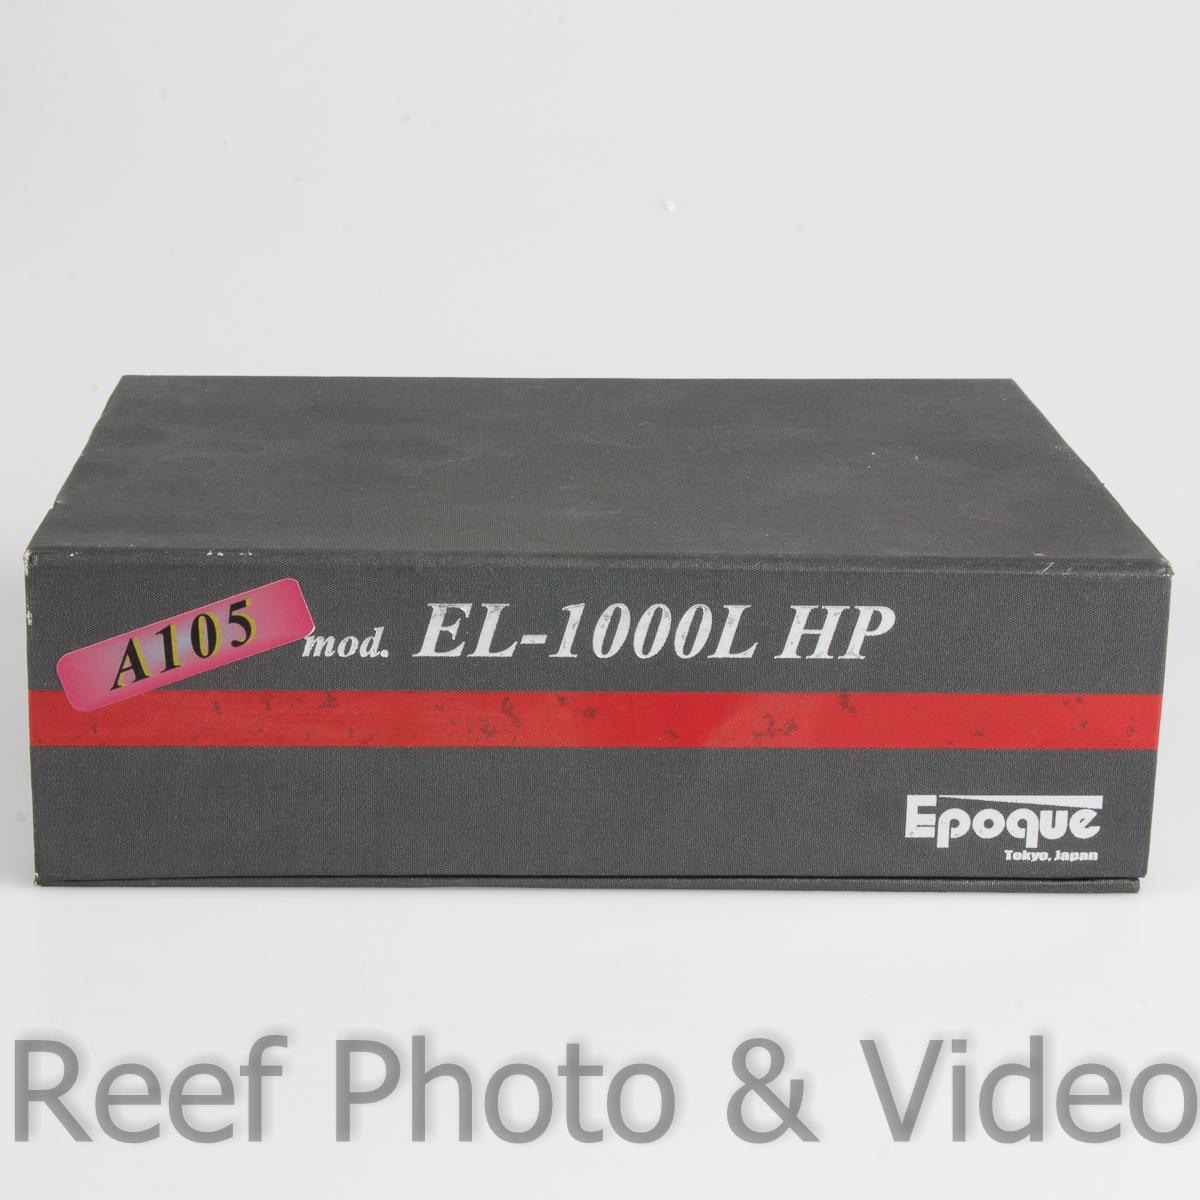 Epoque Underwater High Performance LED Light 1000 lumen ... - photo#14